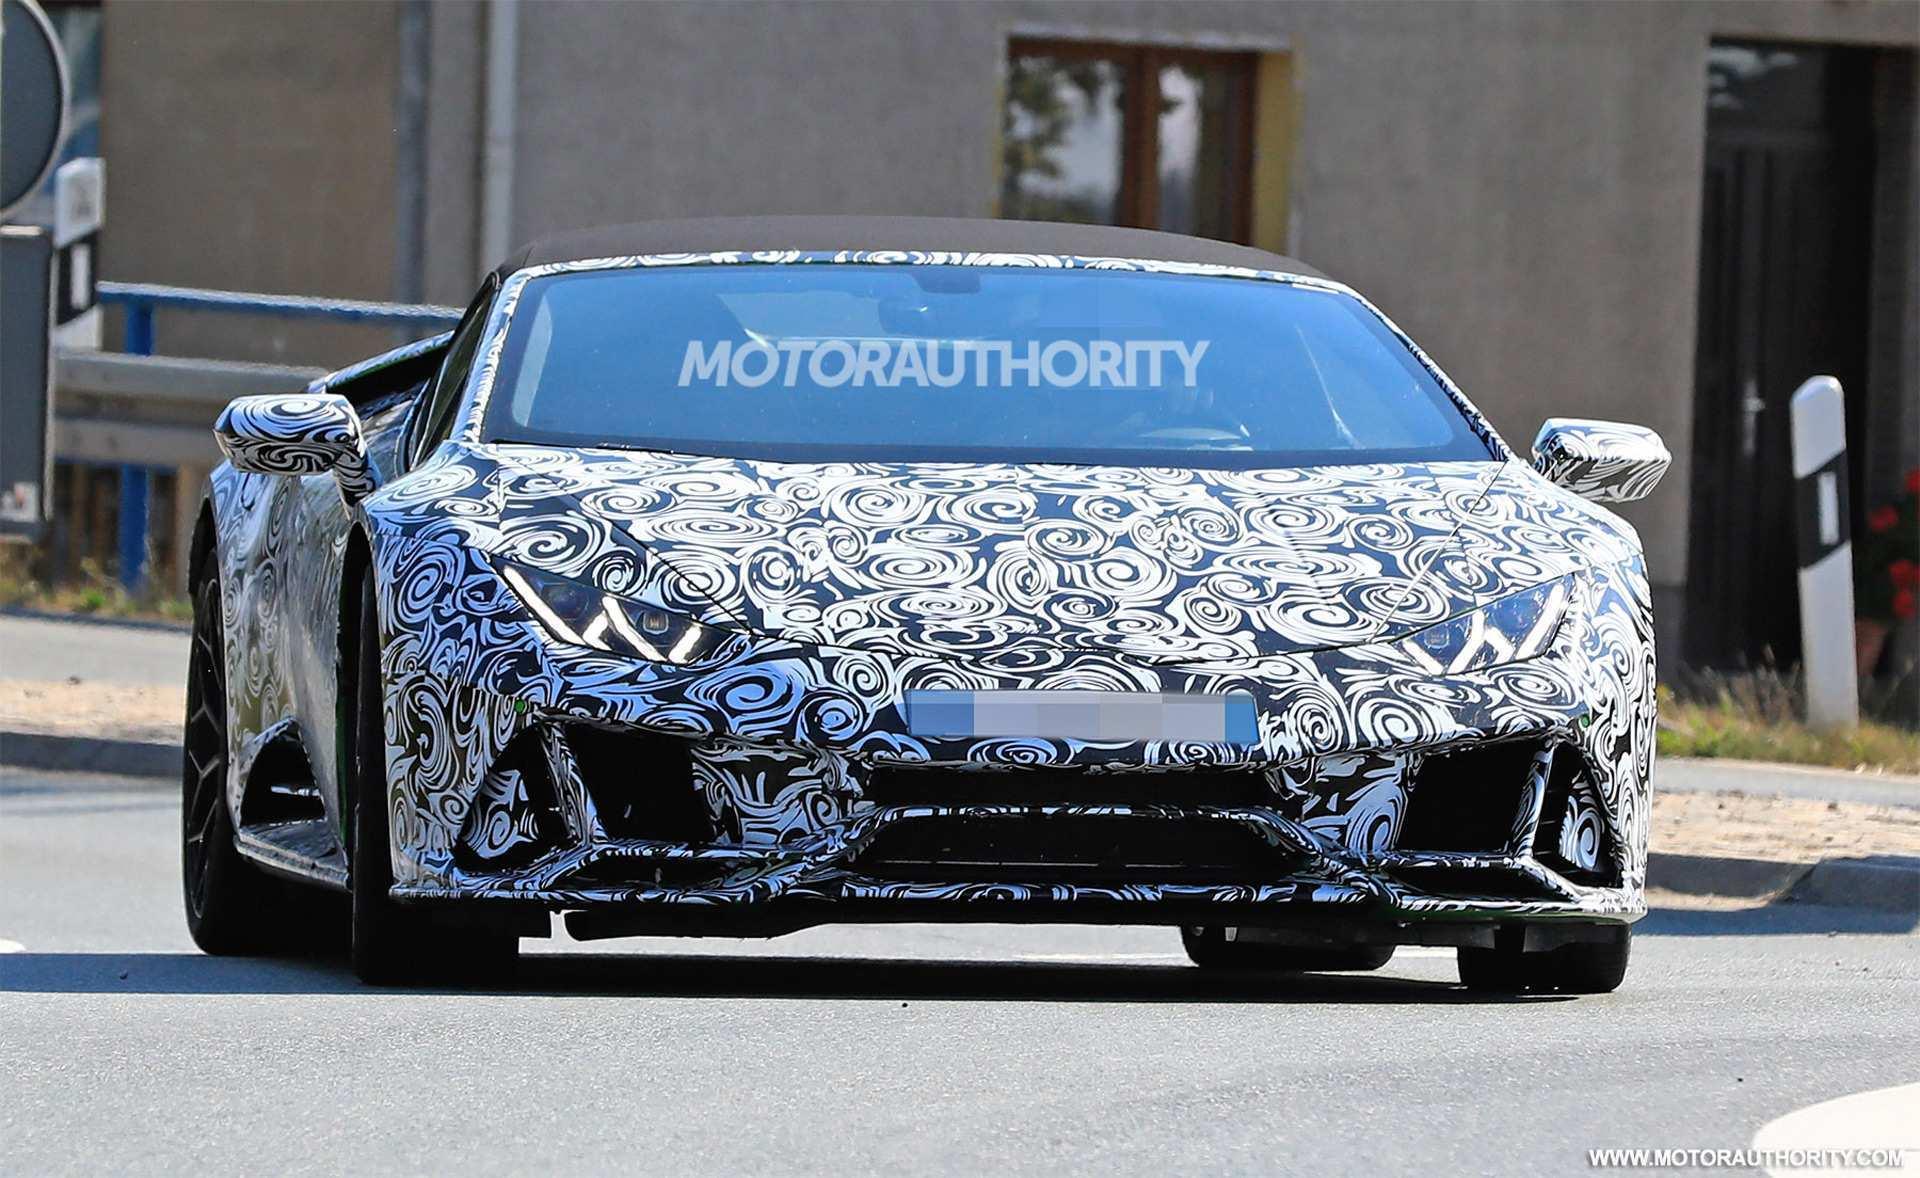 32 Best Review The 2020 Lamborghini Engine with The 2020 Lamborghini